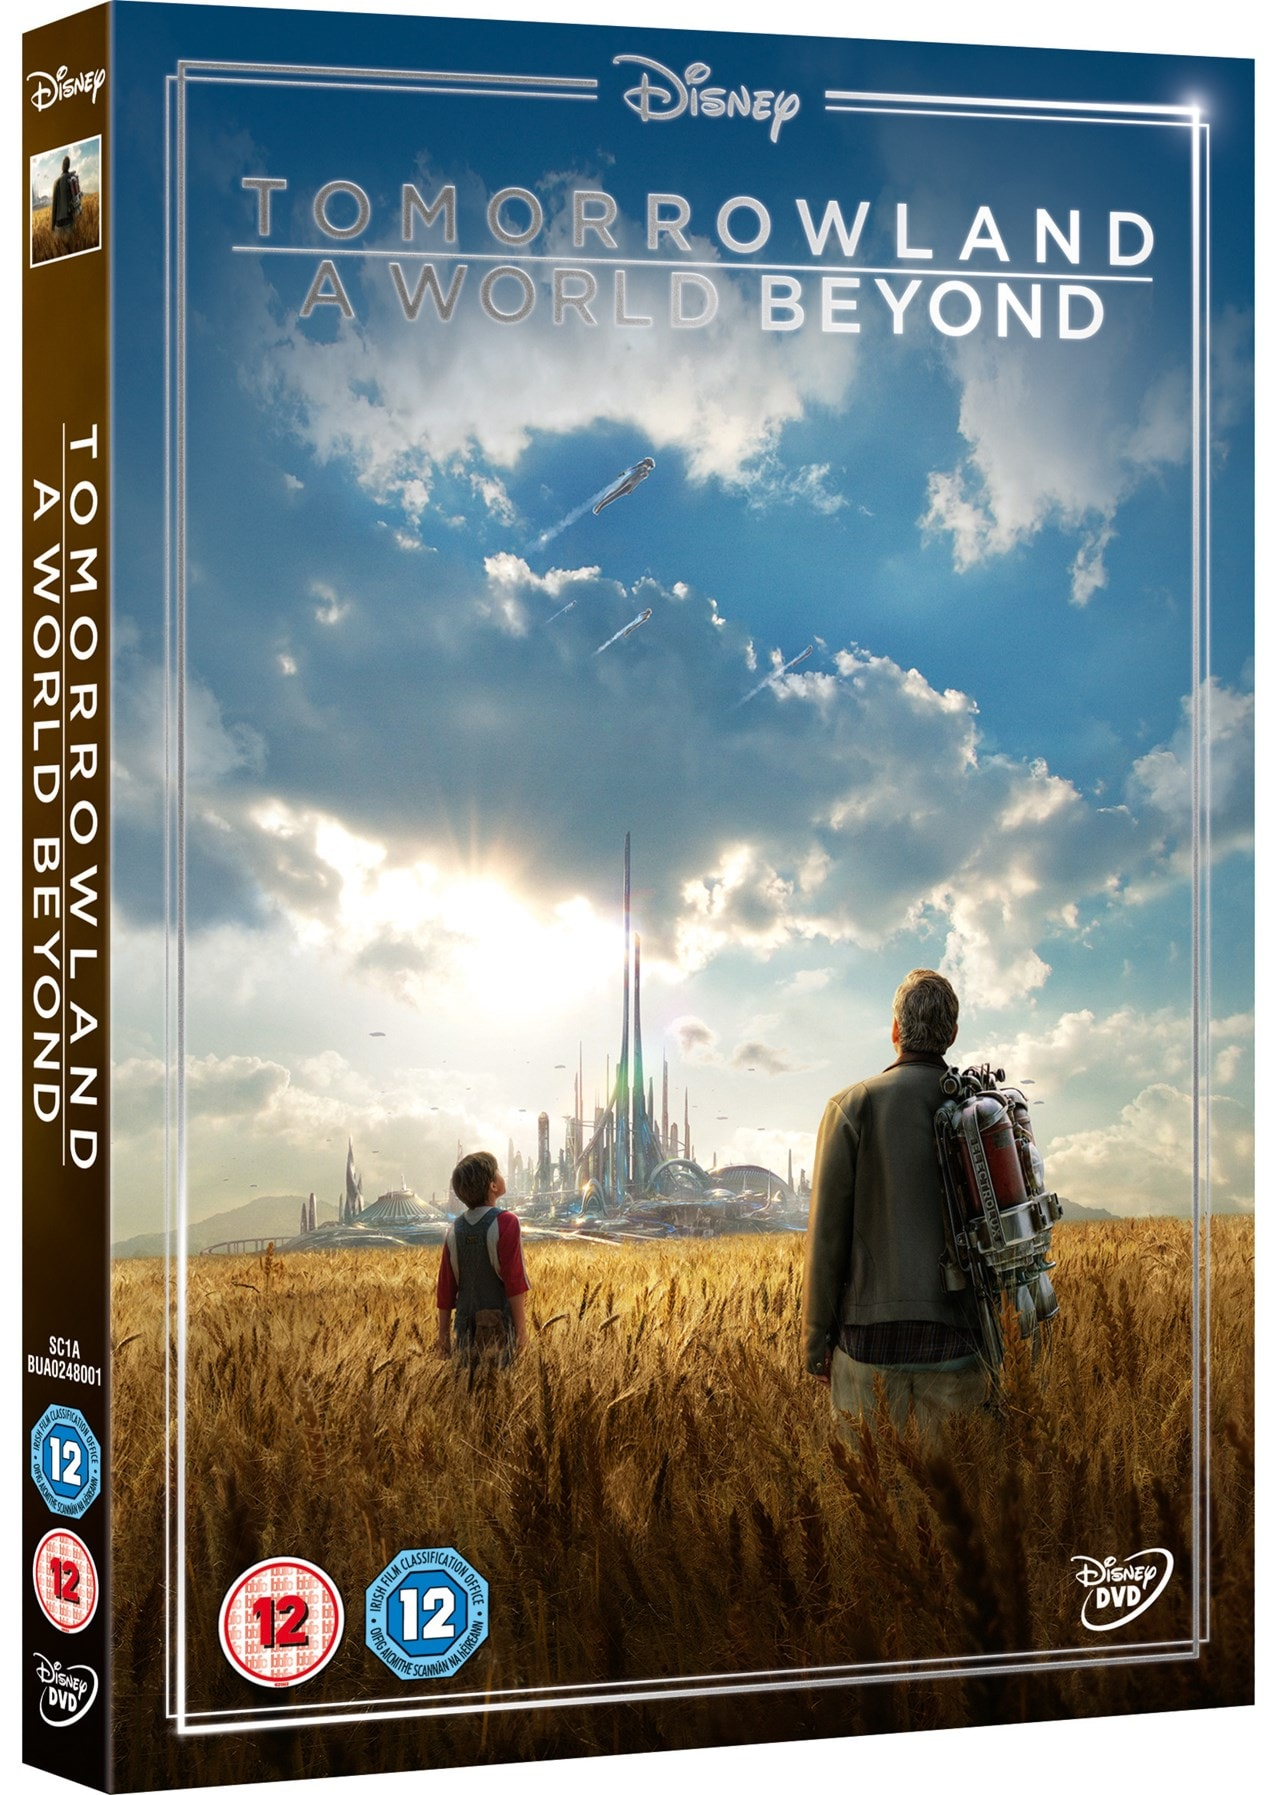 Tomorrowland - A World Beyond - 4